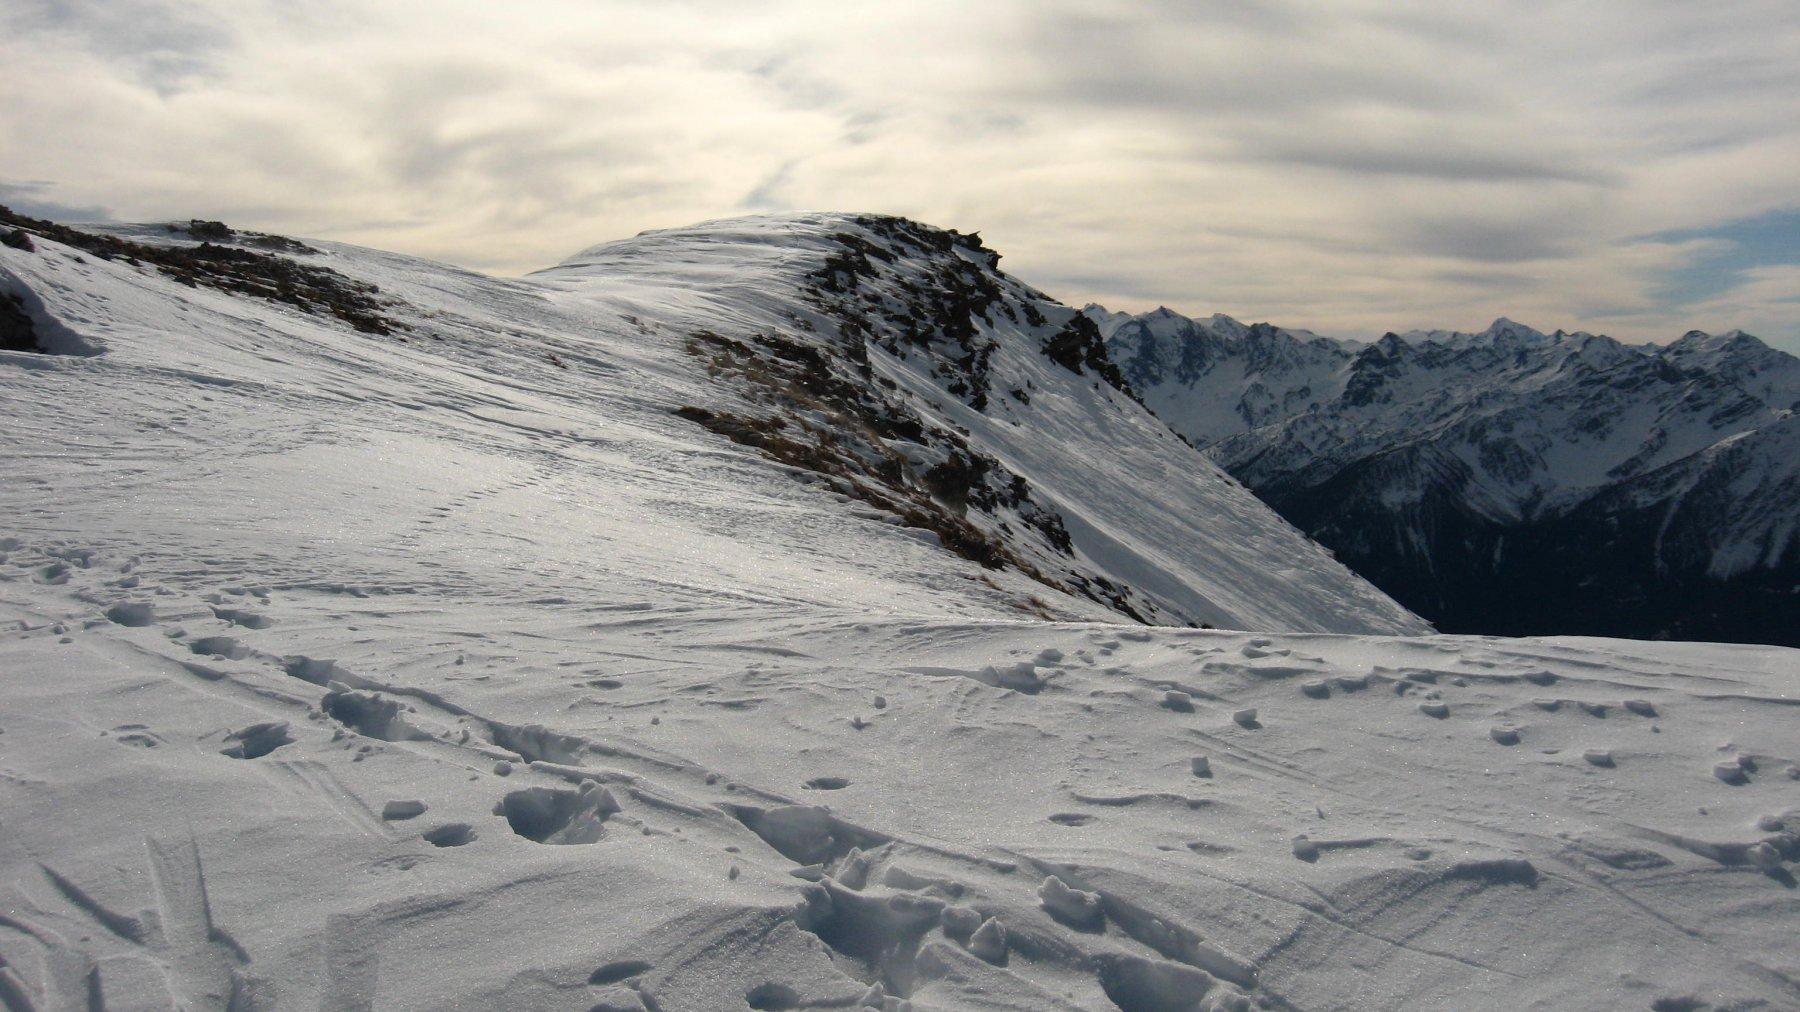 Arrivo, vista verso valle centrale